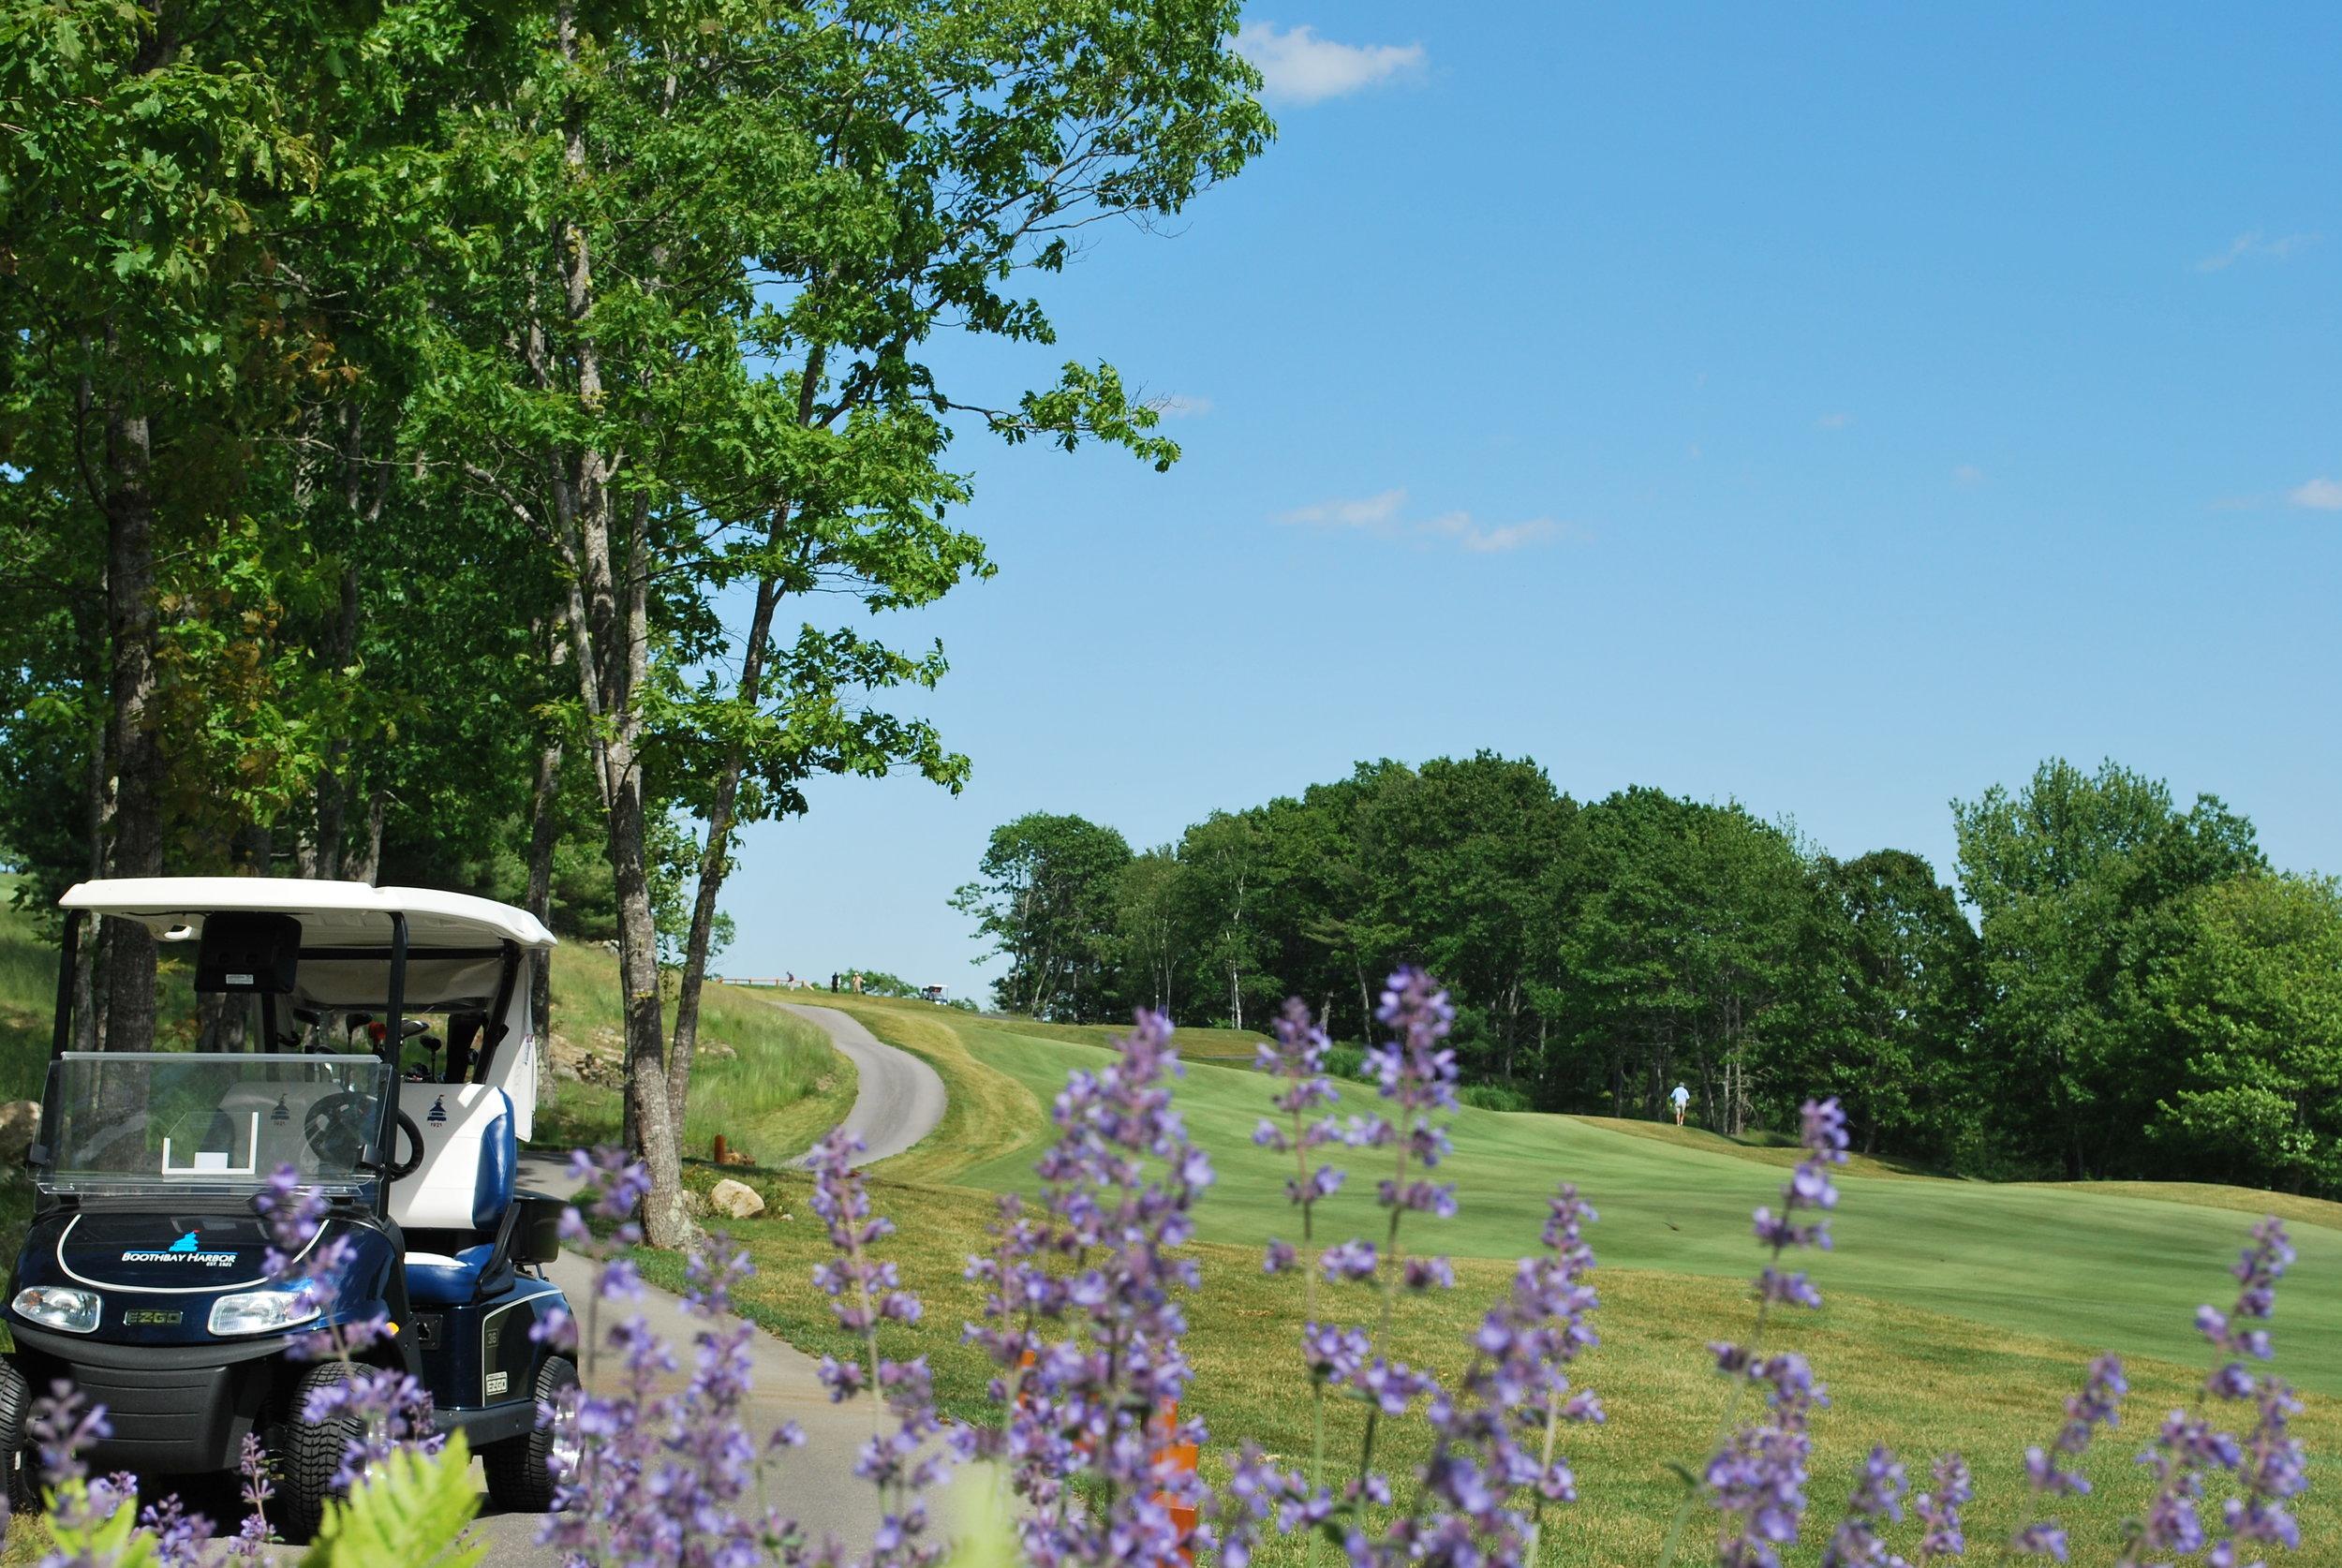 GPS-enabled Golf Carts